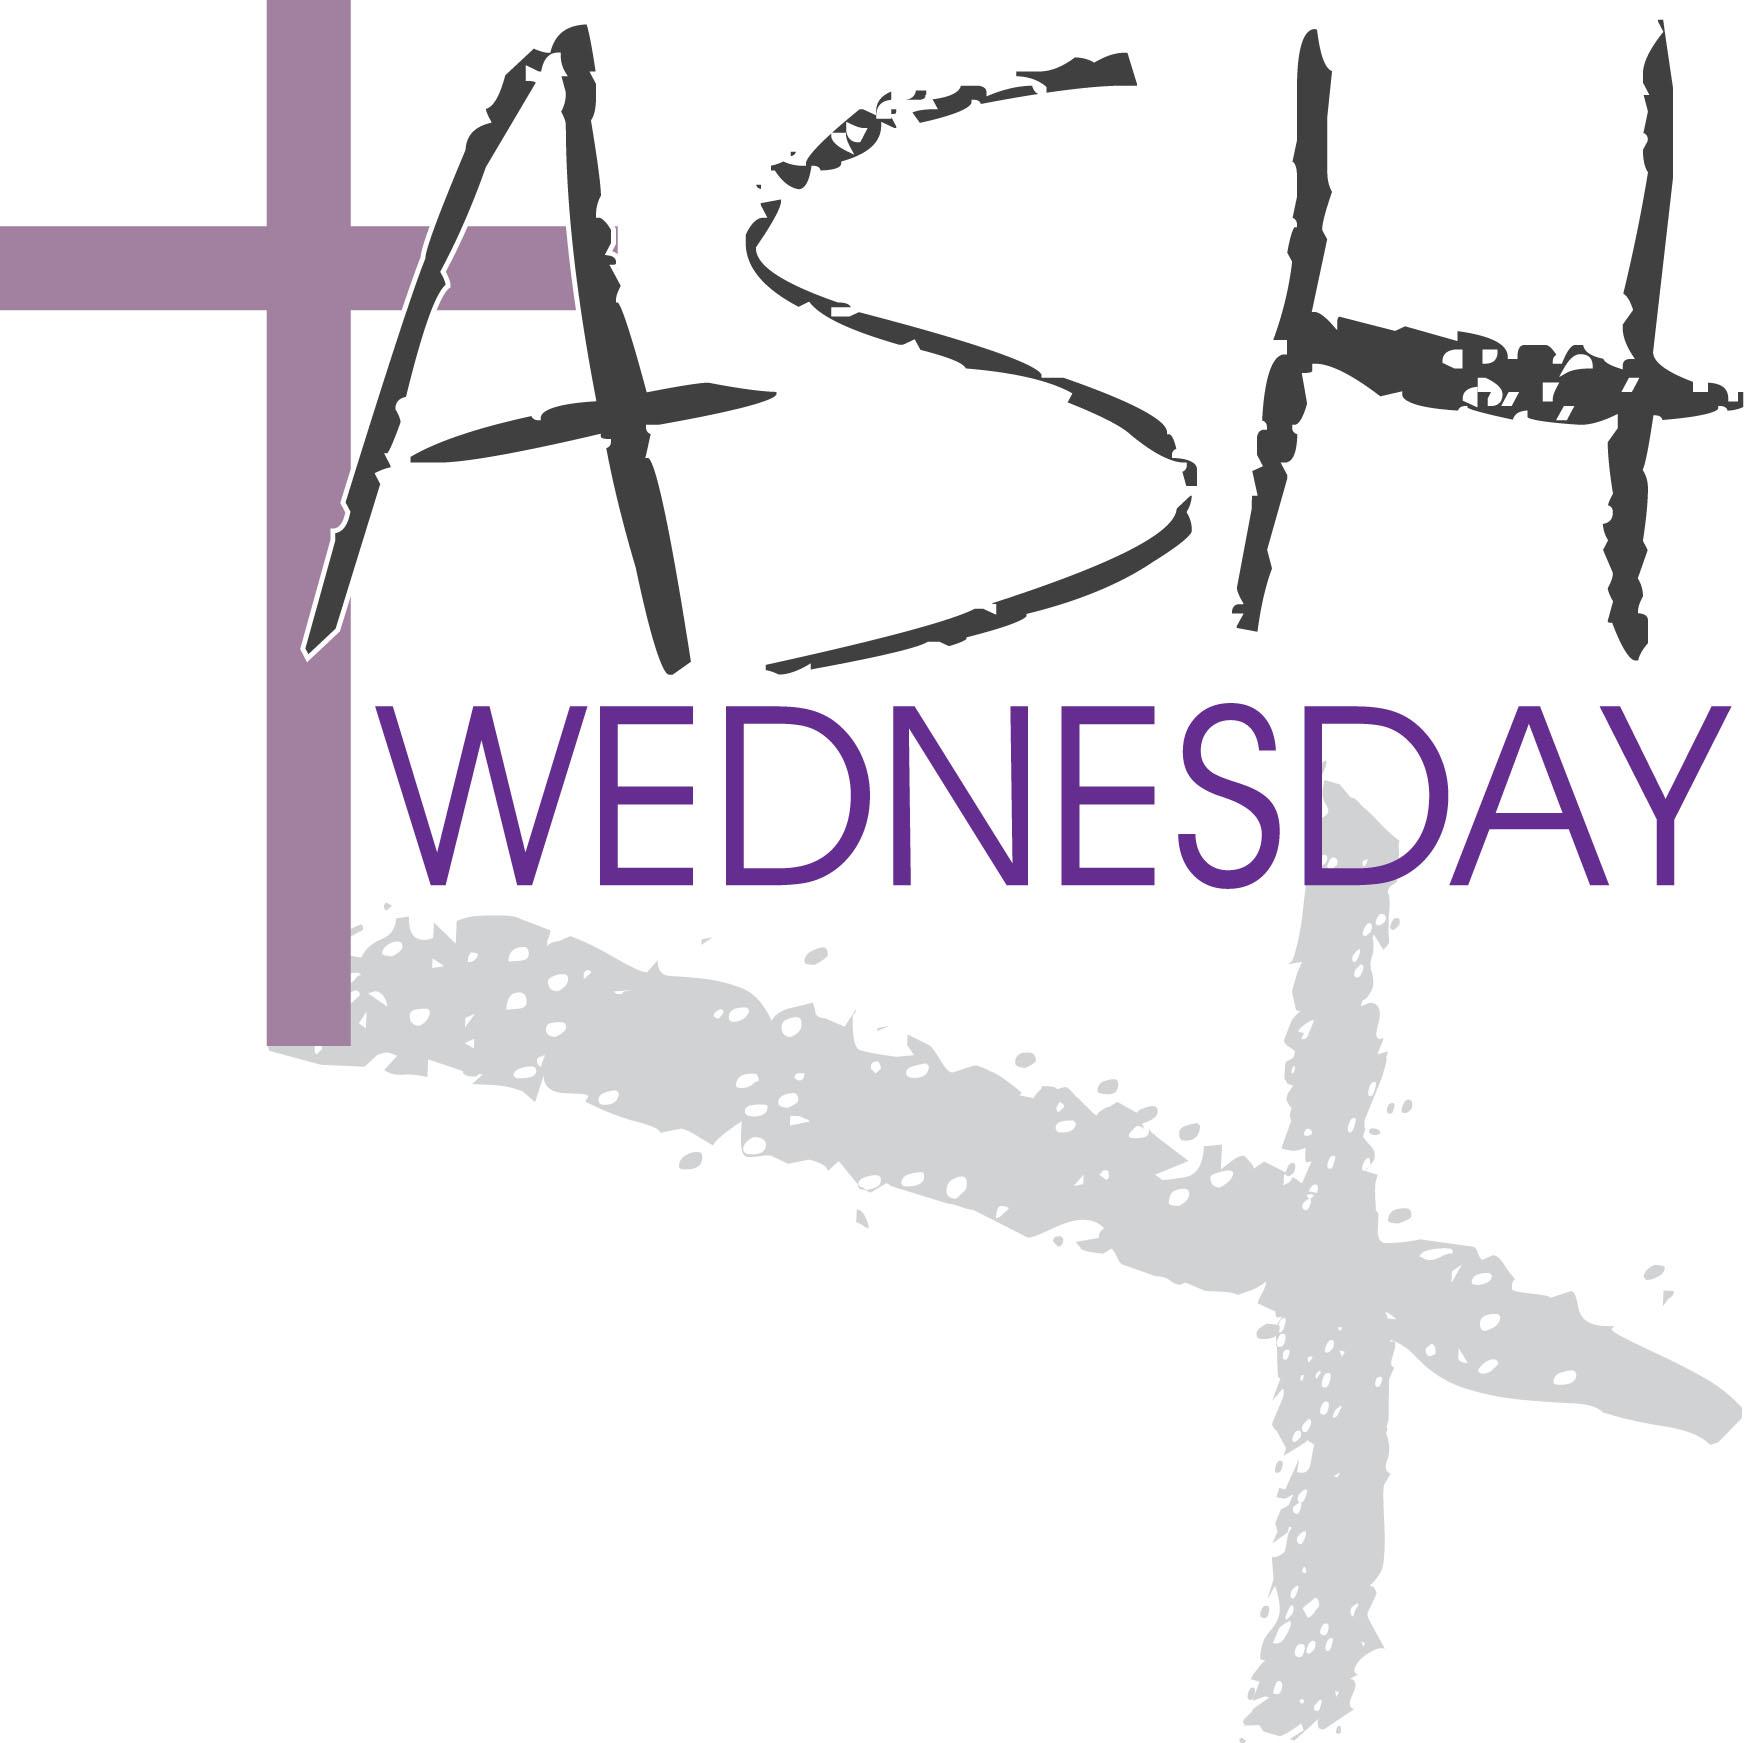 Ash Wednesday clipart-Ash Wednesday clipart-12